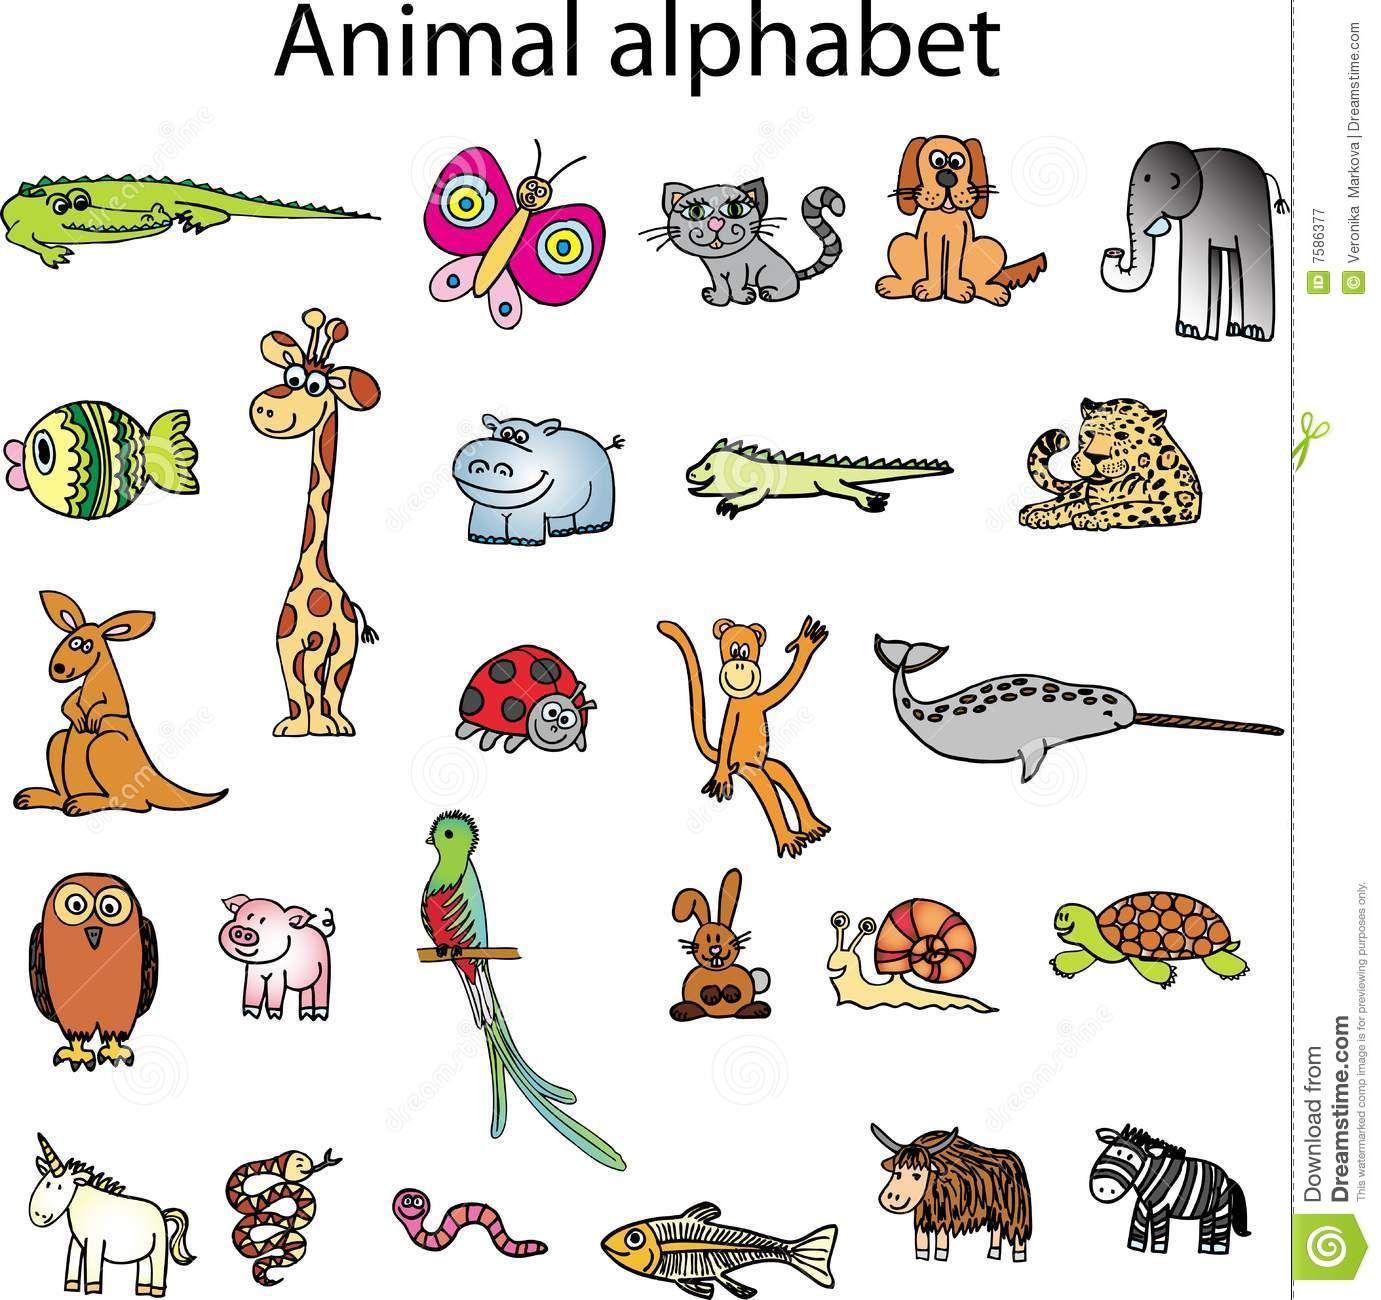 Animals From Animal Alphabet Royalty Free Stock Photography Image 7586377 Animal Alphabet Illustrations Kids Vector Illustration